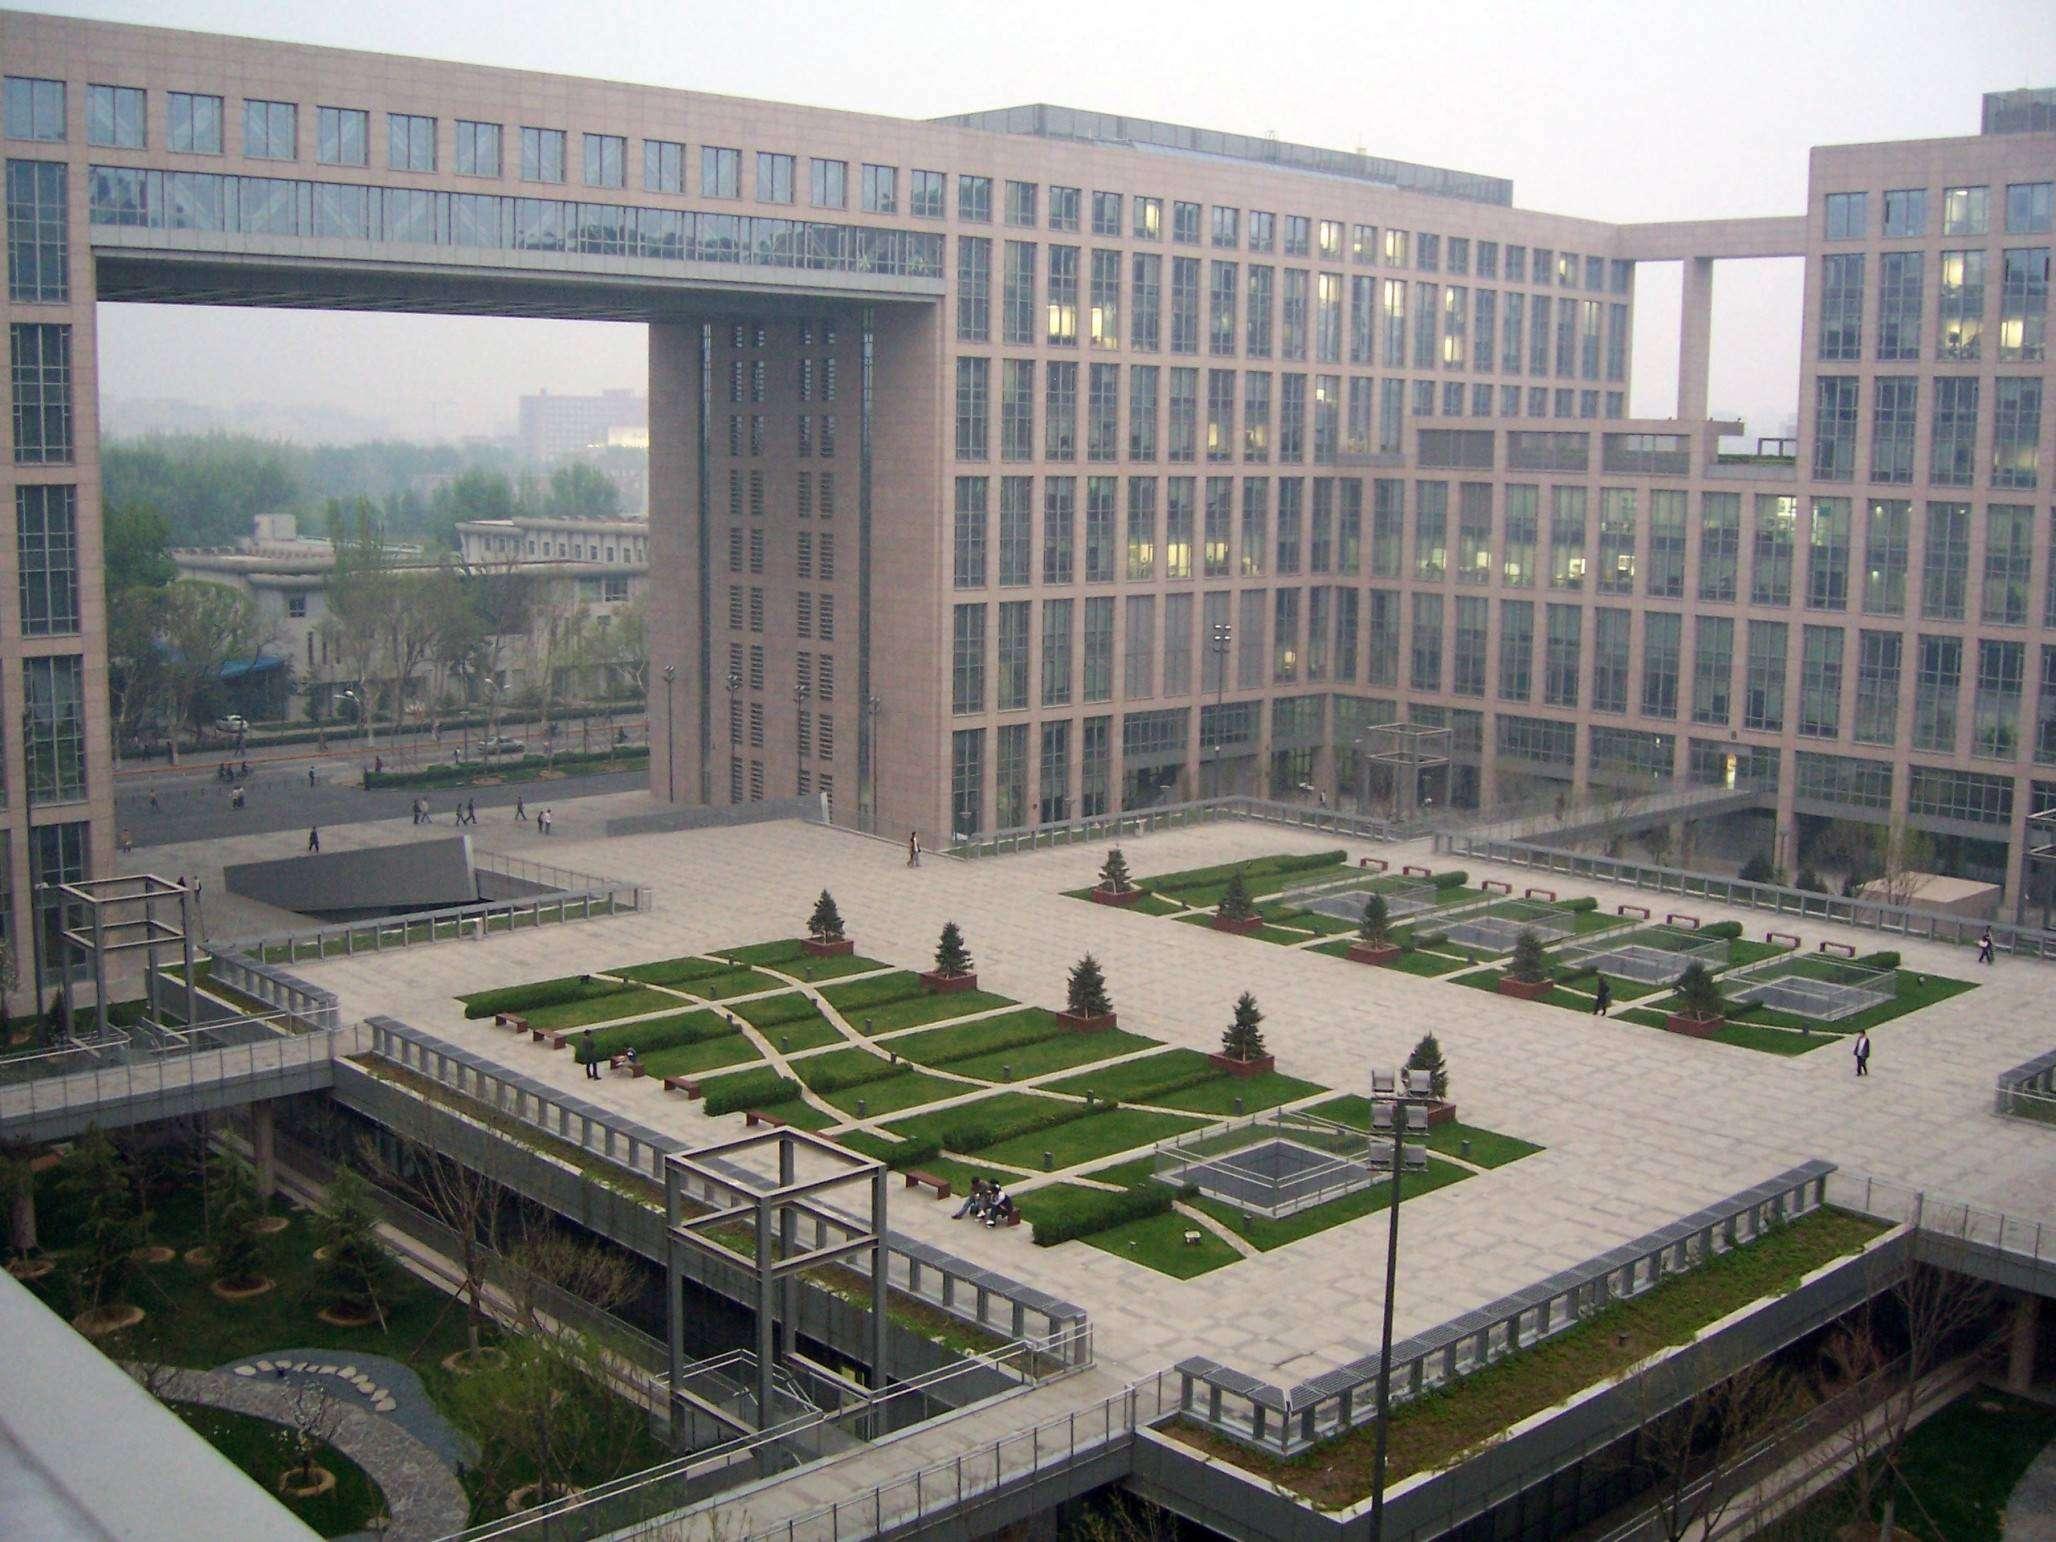 https://i1.wp.com/www.redeangola.info/wp-content/uploads/2015/11/universidade-beihang-china_brianchenming_cc2-.jpg